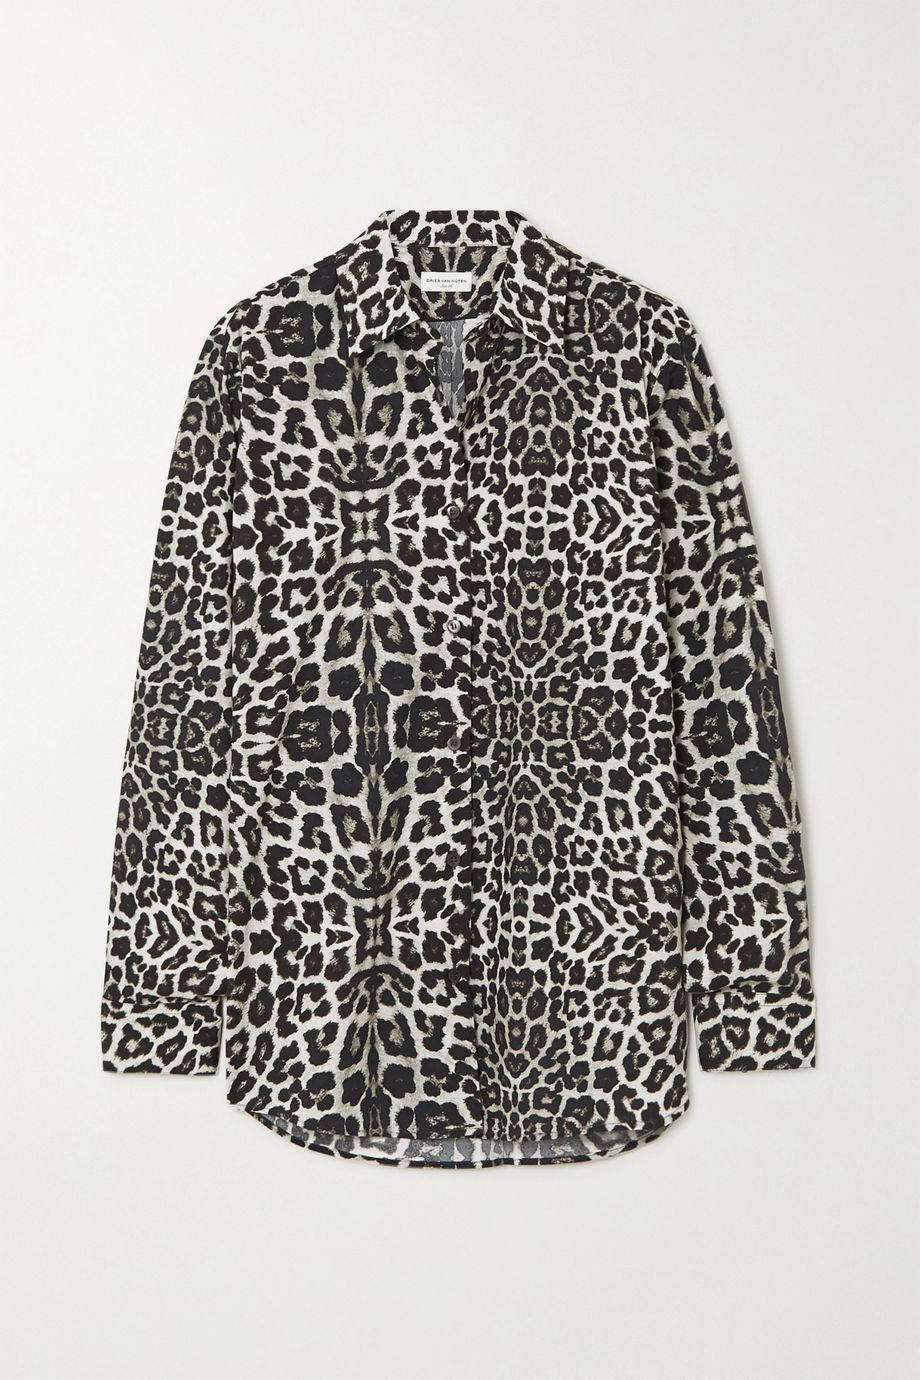 Dries Van Noten Leopard-print cotton-poplin shirt